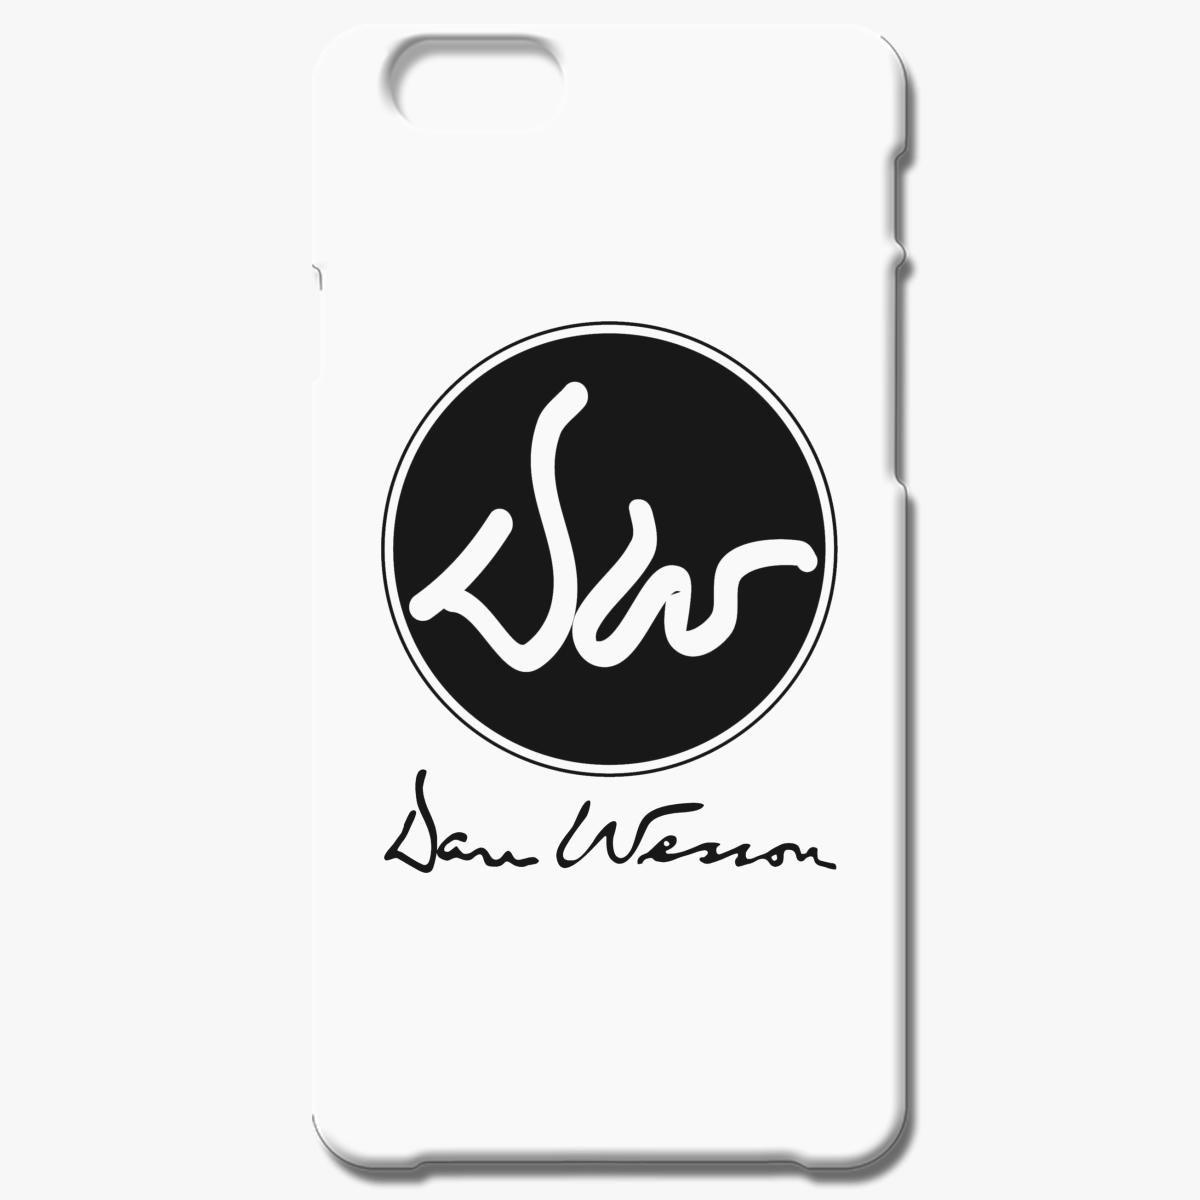 Dan Wesson Firearms Logo Iphone 6 6s Case